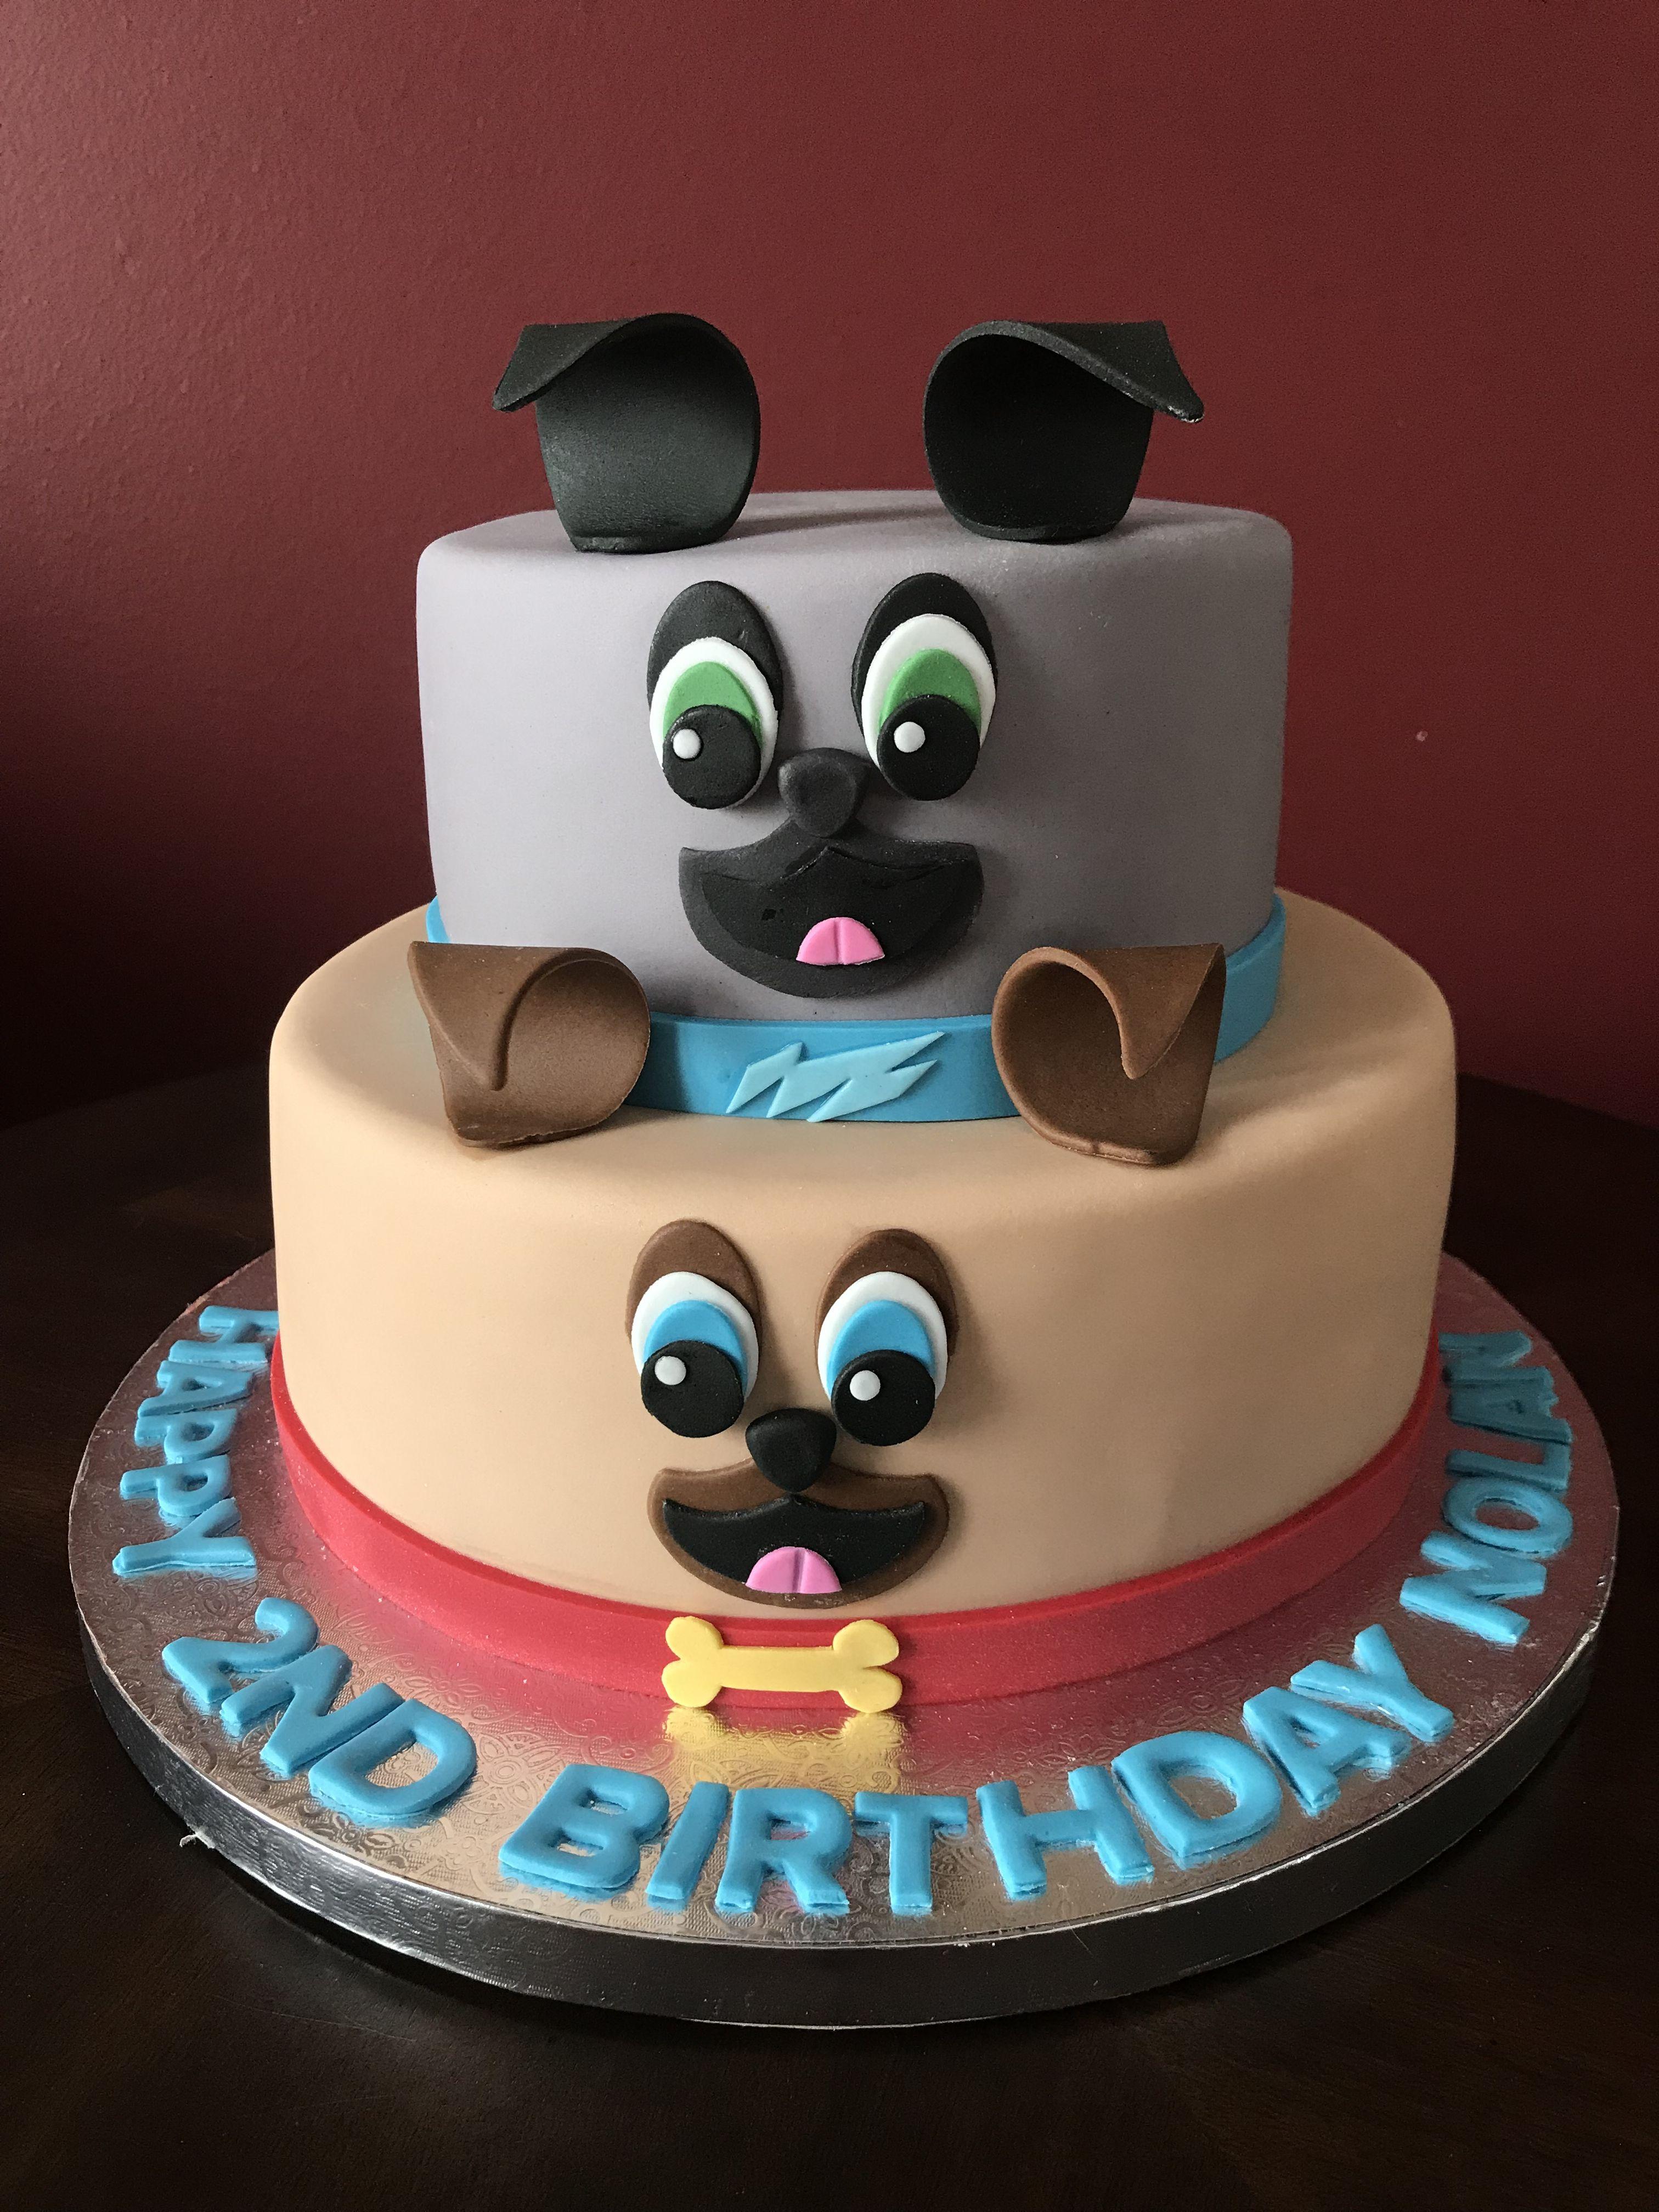 Puppy dog pals birthday cake puppy cake dog cakes cake